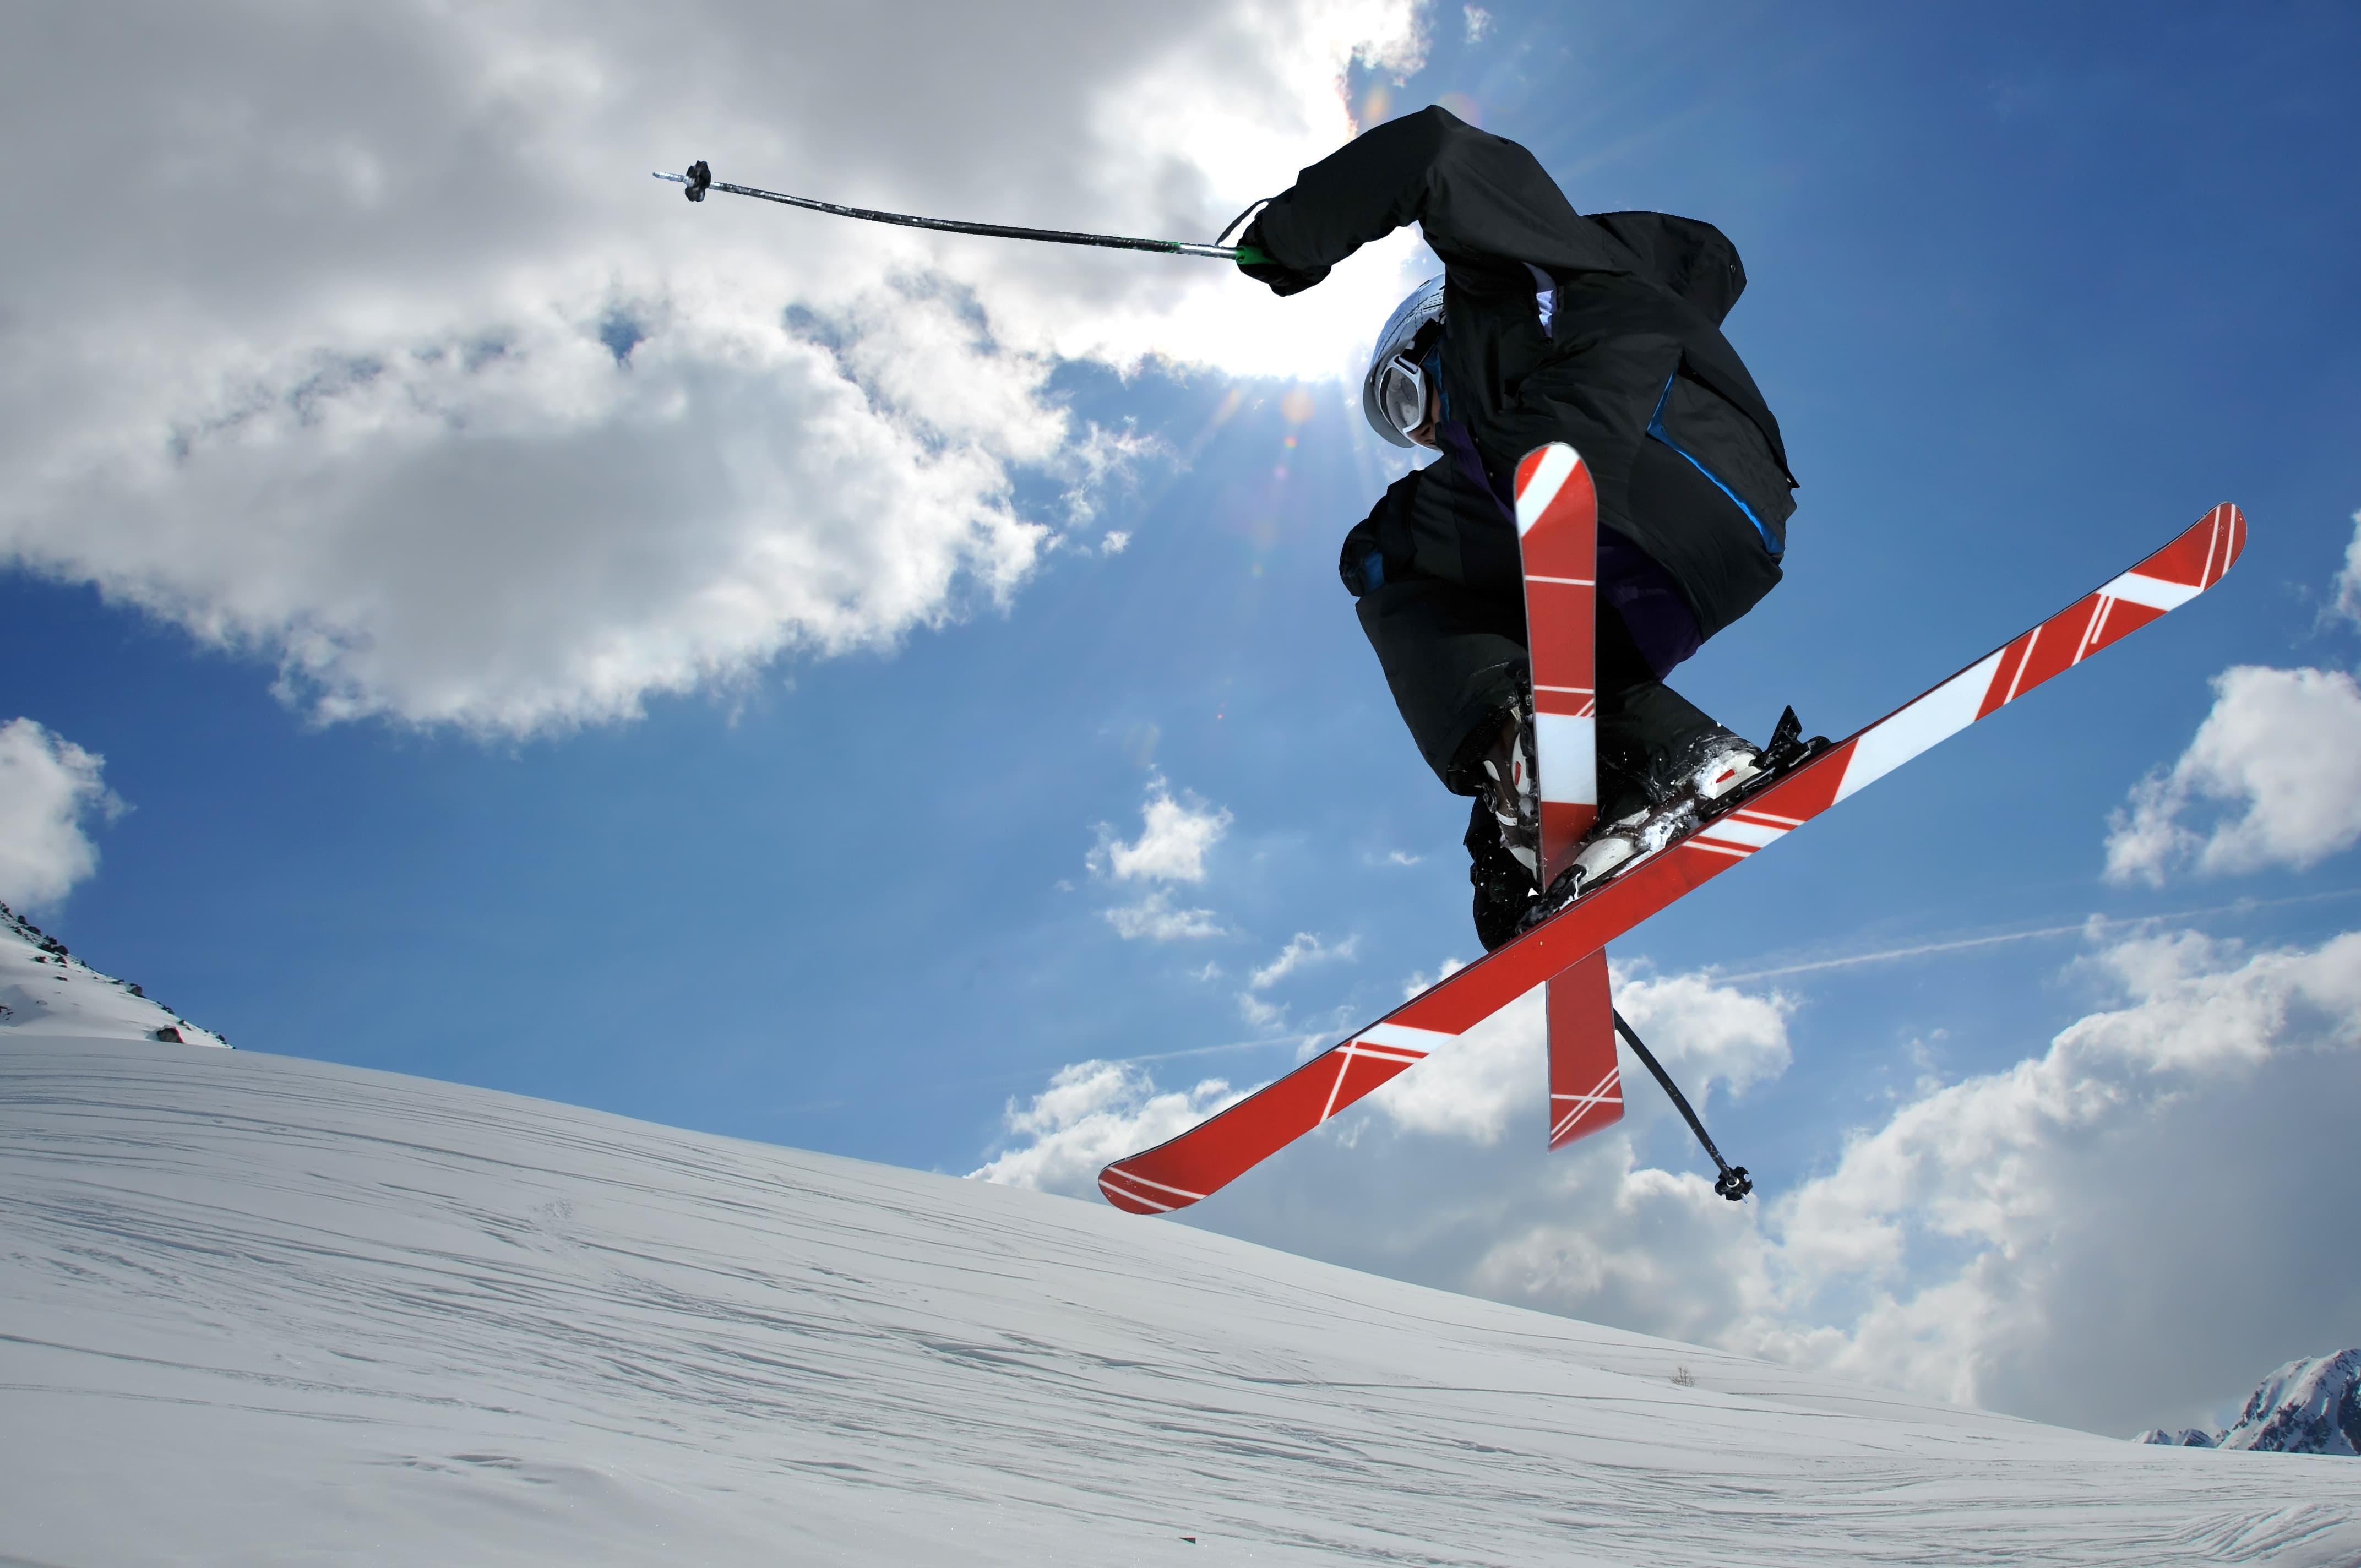 Top Ski Locations in Canada